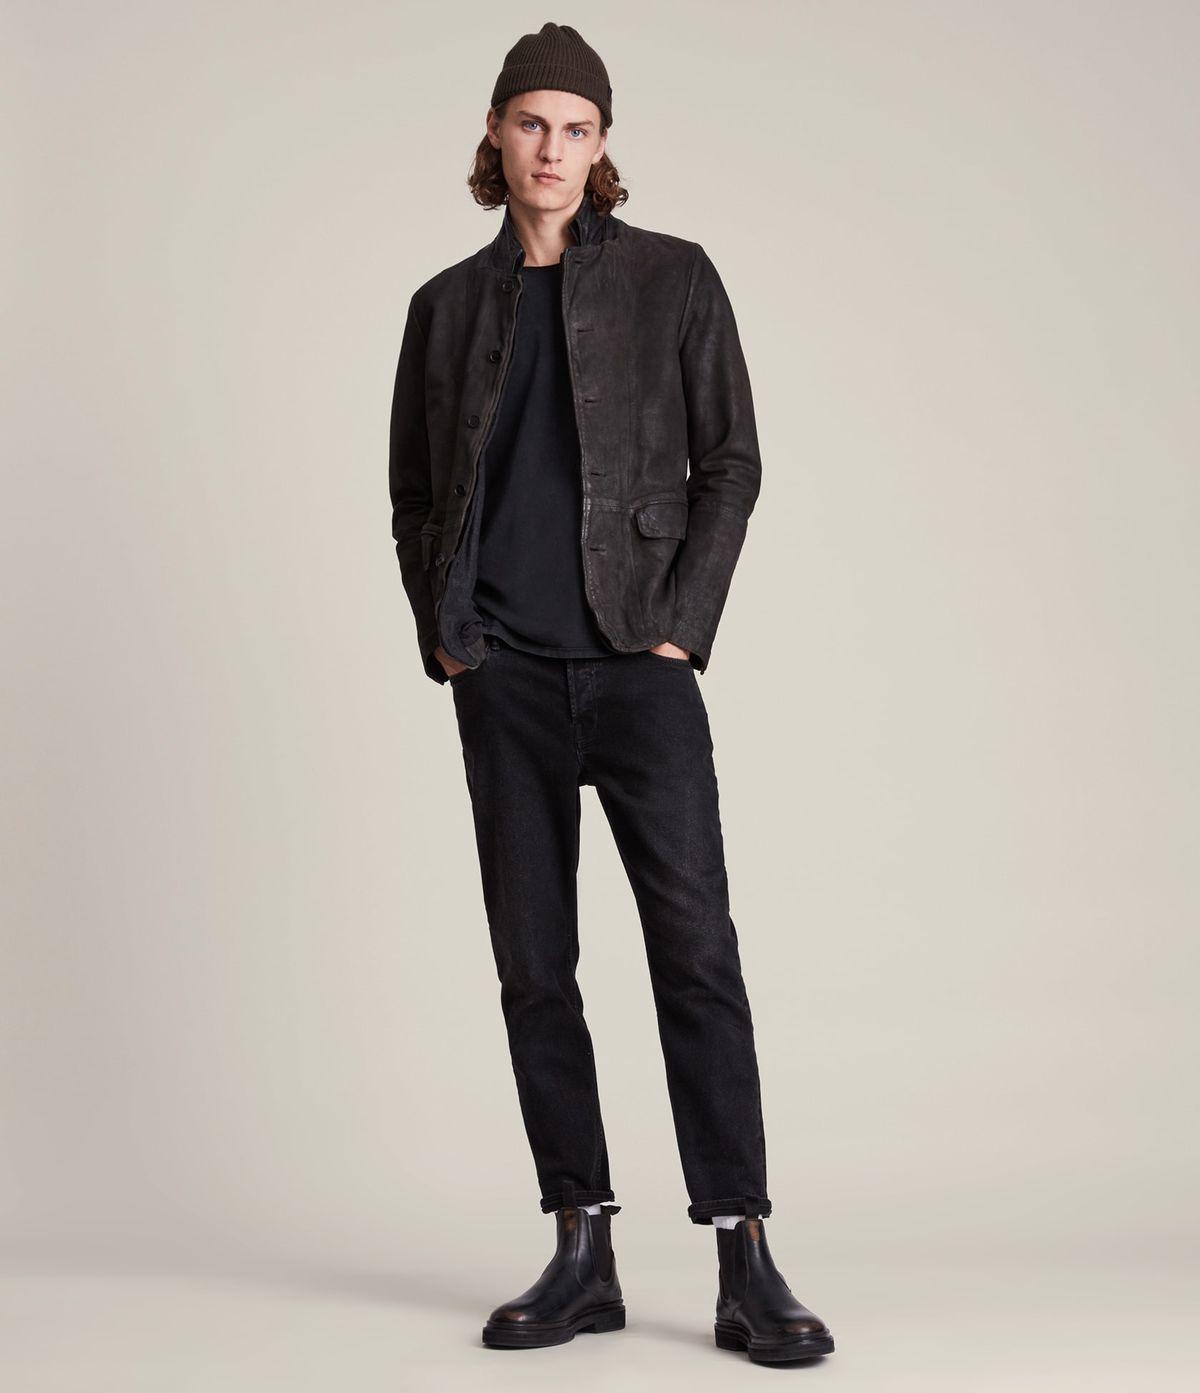 Men's Survey Leather Jacket - Outfit Front View